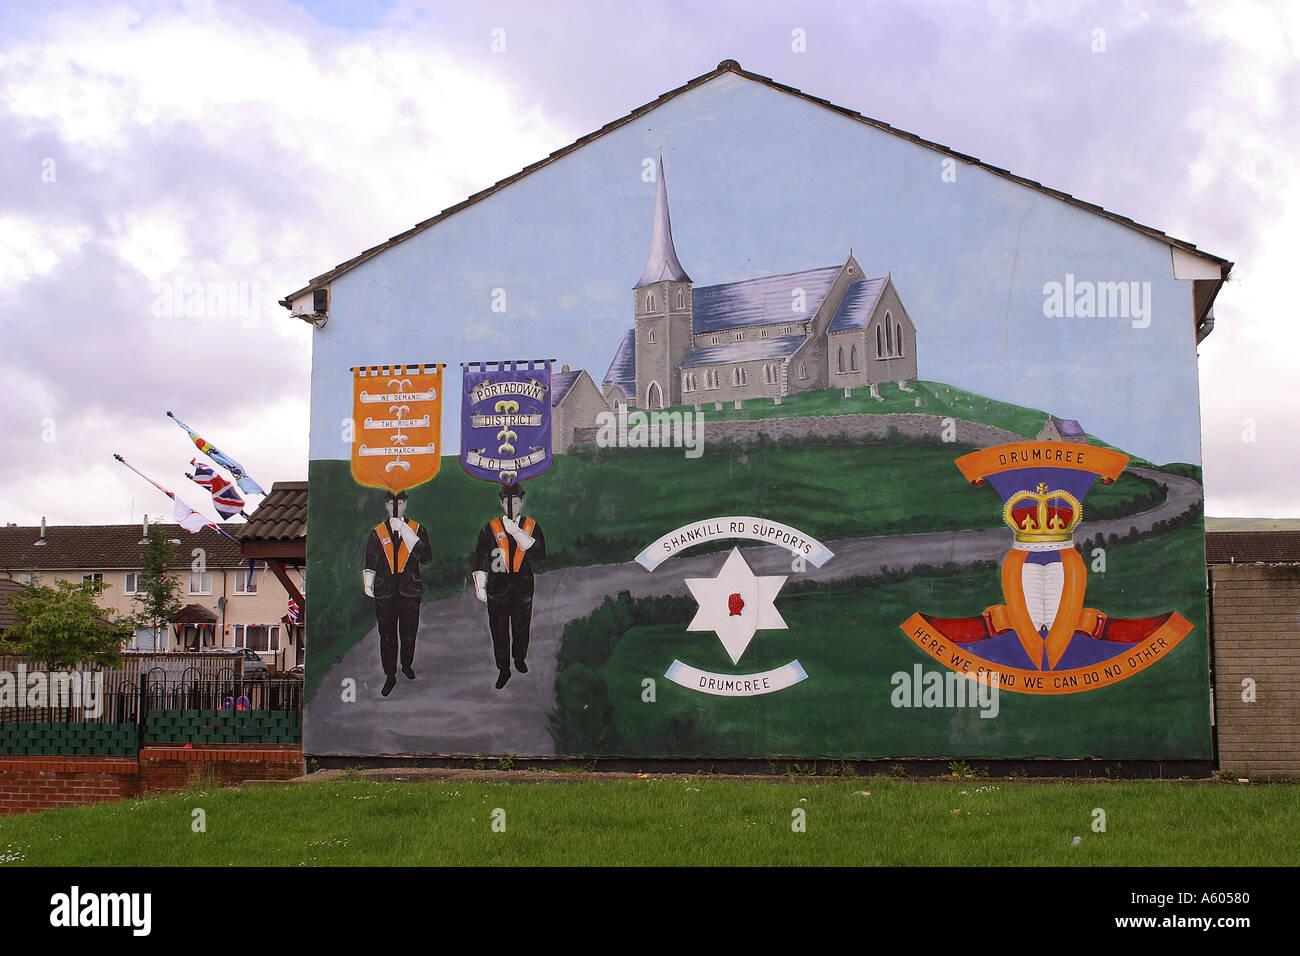 Drumcree Loyalist mural in lower Shankill estate Stock Photo